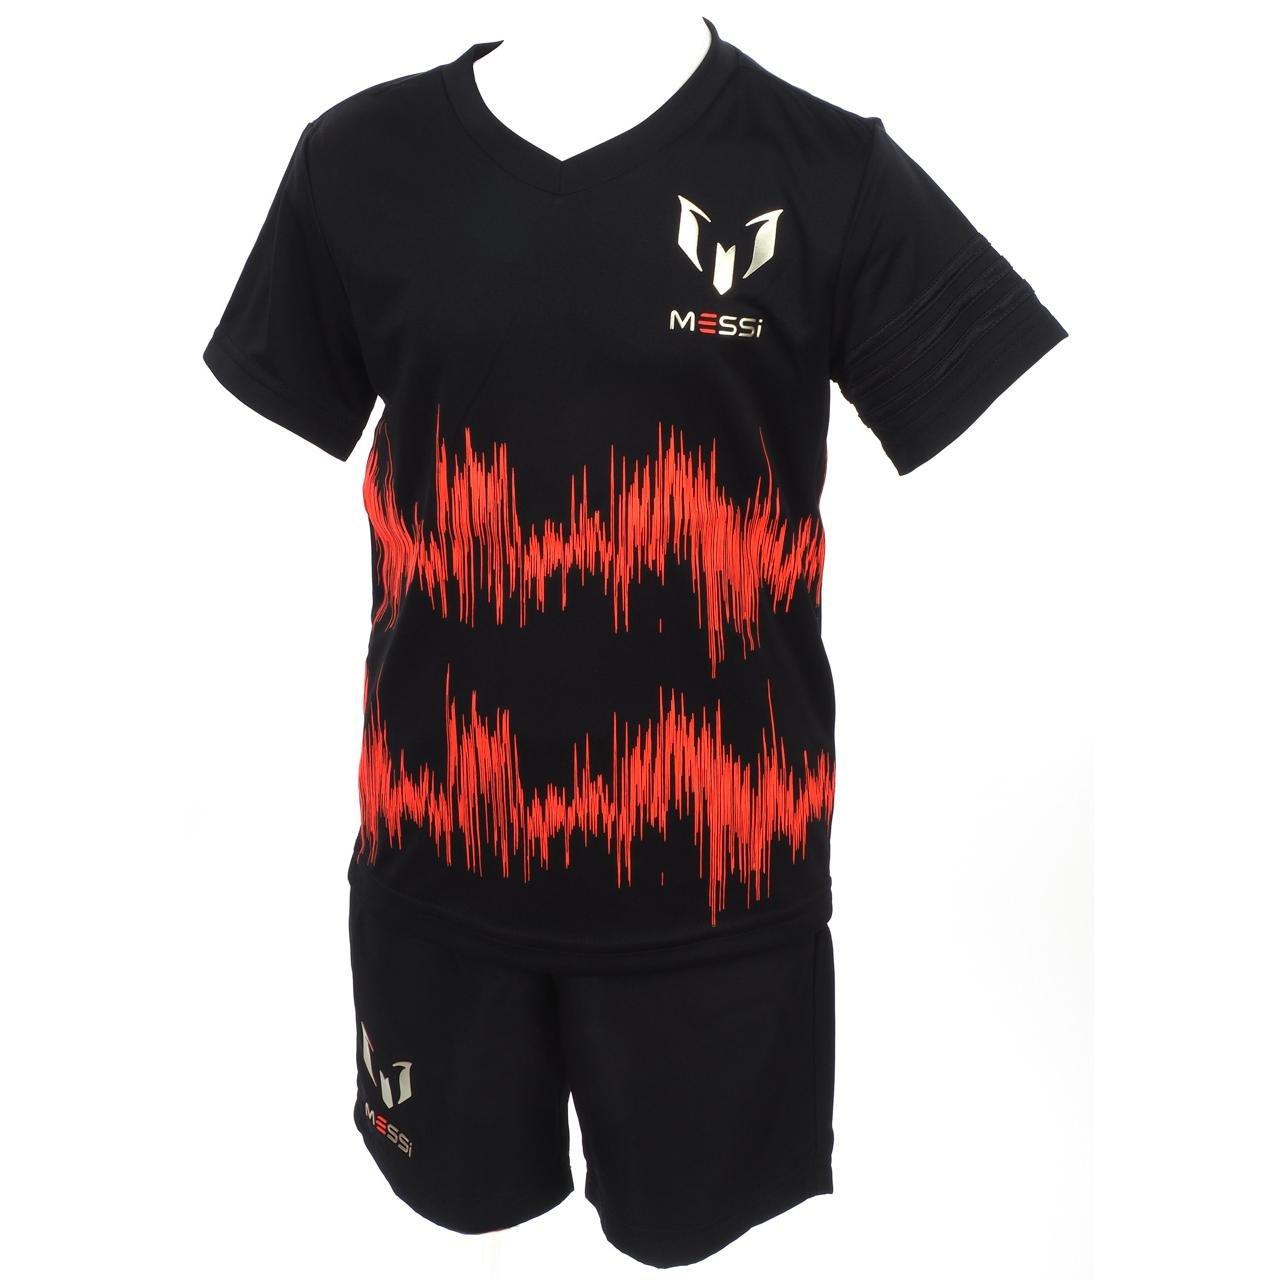 Juego Negro de s conjunto adidas/ Kid s I MM Messi Negro/ Rojo/ Plateado/ Negro/ Rojsol f82b53c - rogvitaminer.website